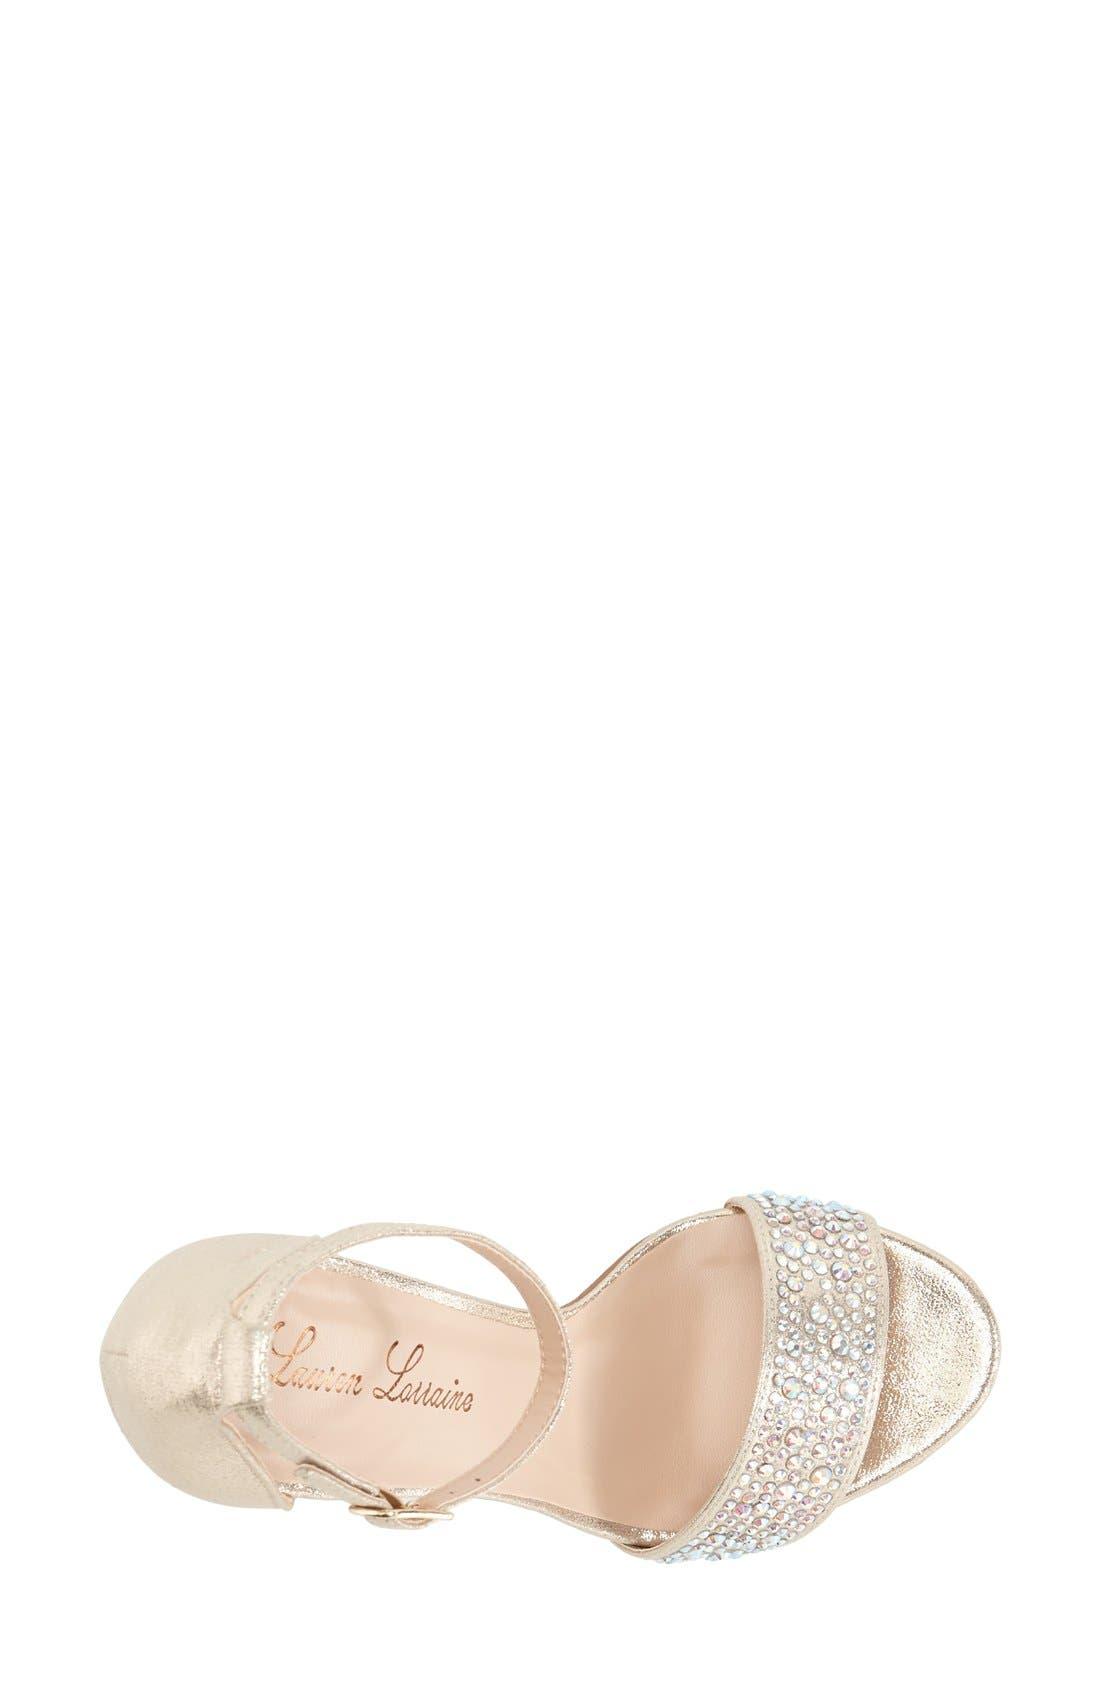 Alternate Image 3  - Lauren Lorraine 'Arielle' Ankle Strap Sandal (Women)